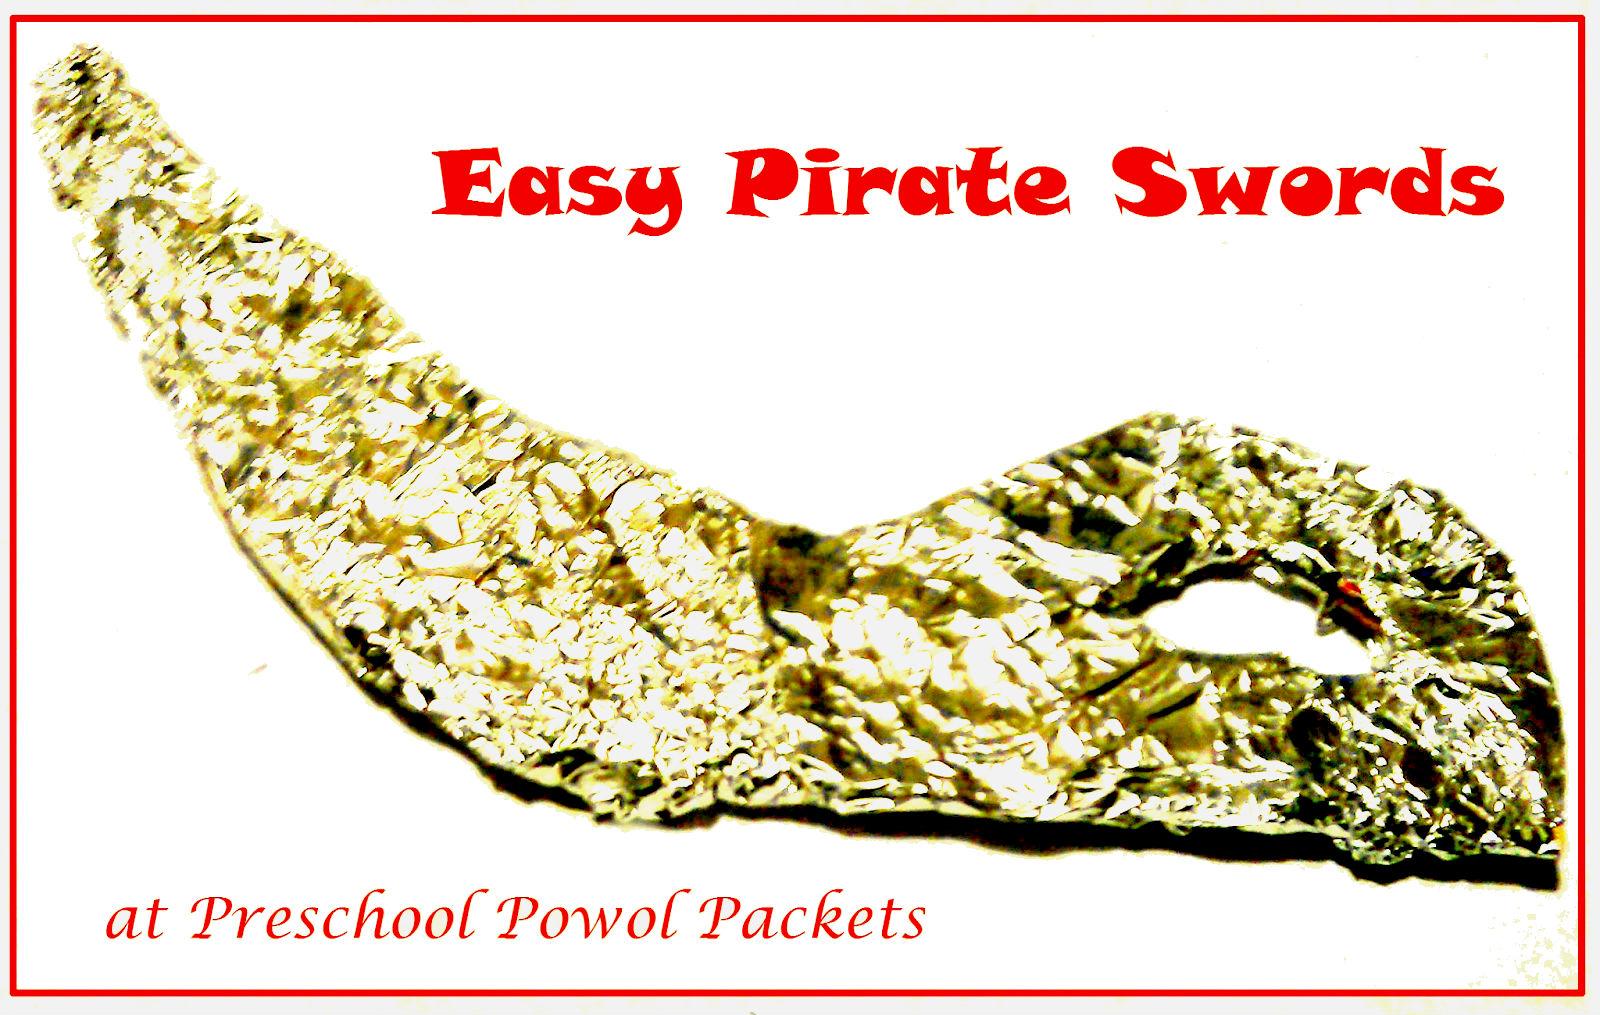 easy pirate sword for preschoolers preschool powol packets